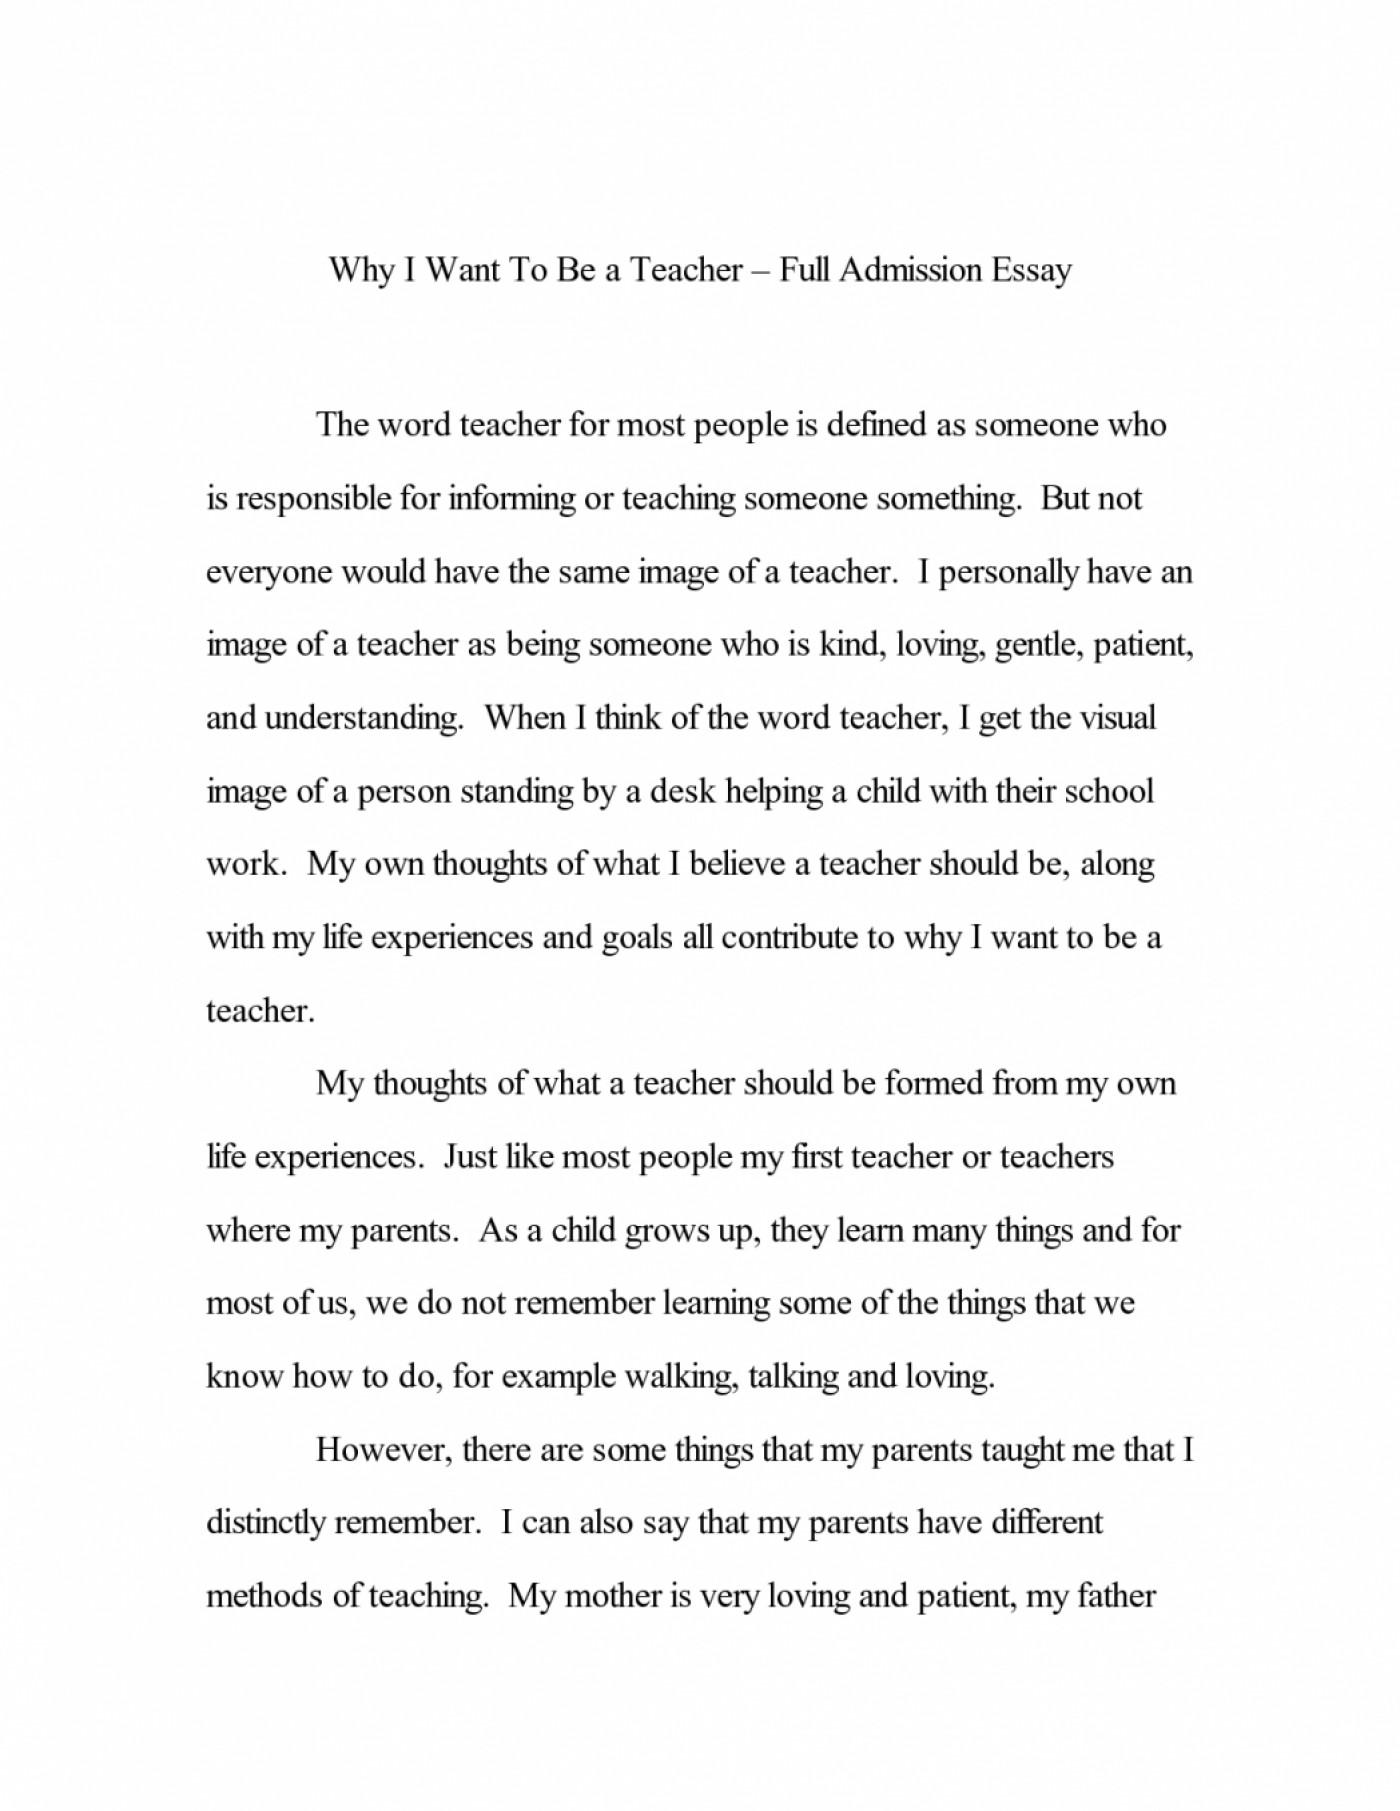 University of Florida Undergraduate College Application Essays | GradeSaver